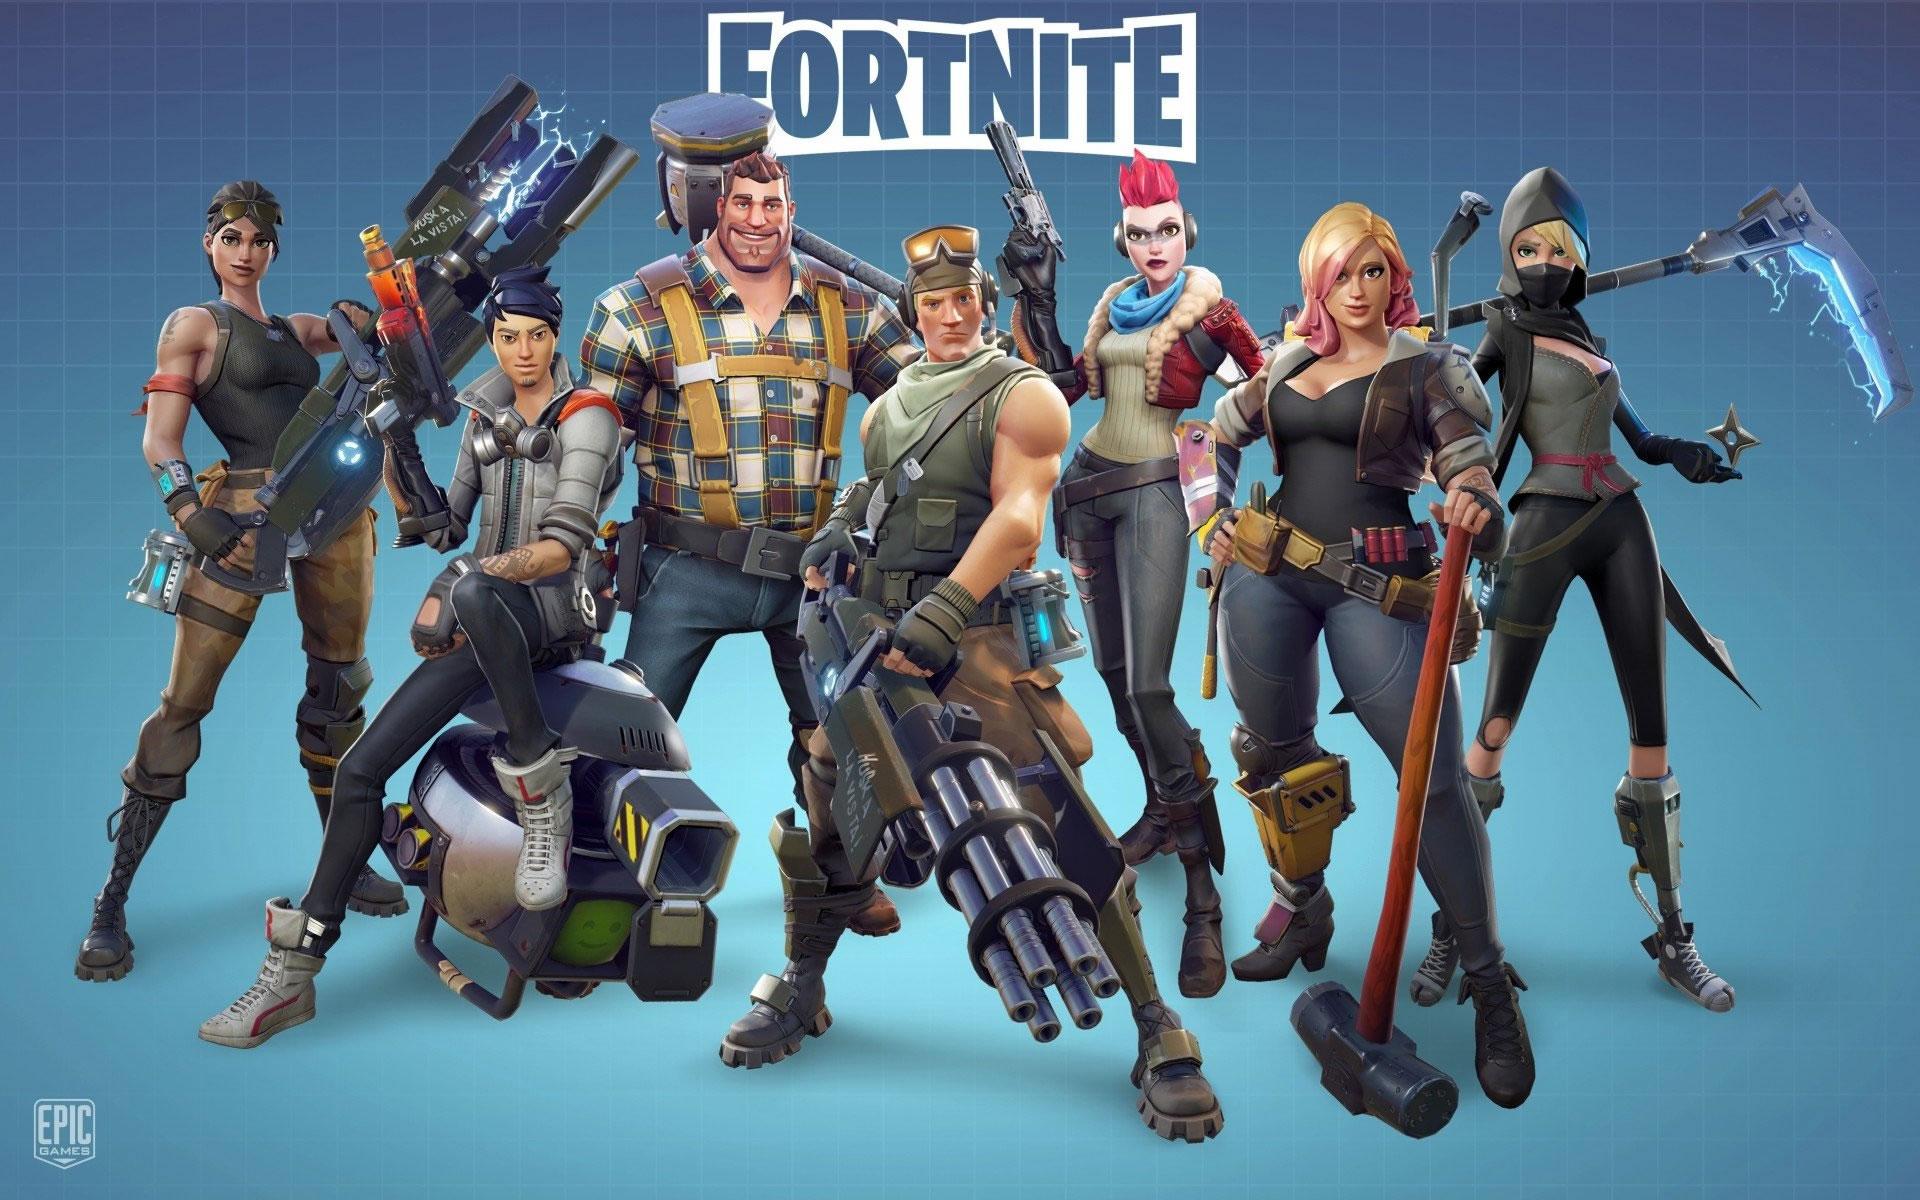 download wallpaper: Fortnite skins wallpaper